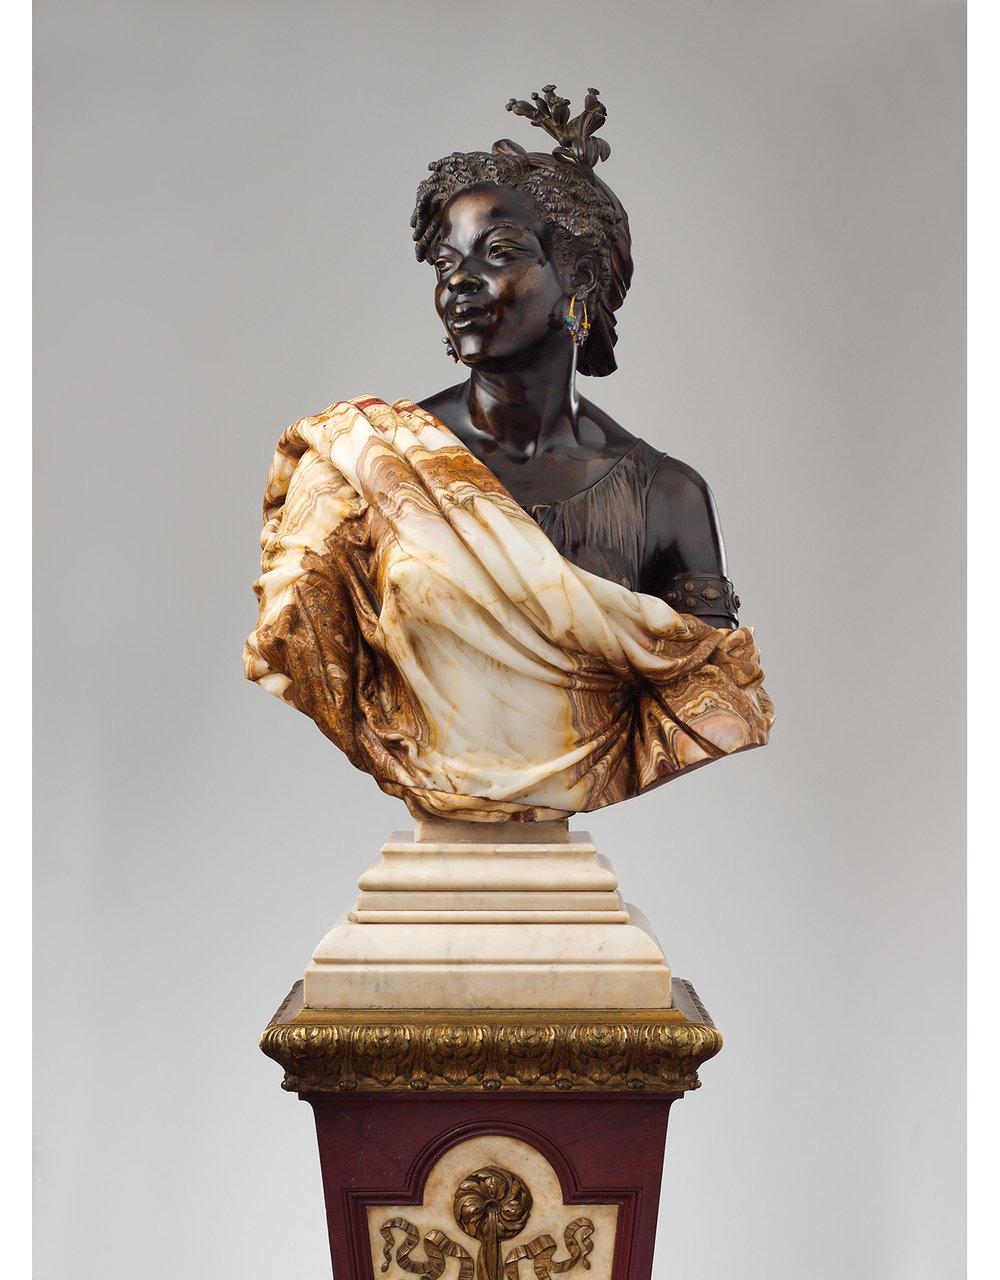 "Charles-Henri-Joseph Cordier, attributed to designs by Charles-François Rossigneux, ""La Capresse des Colonies"" (1861). The Metropolitan Museum of Art, European Sculpture and Decorative Arts Fund, 2006."